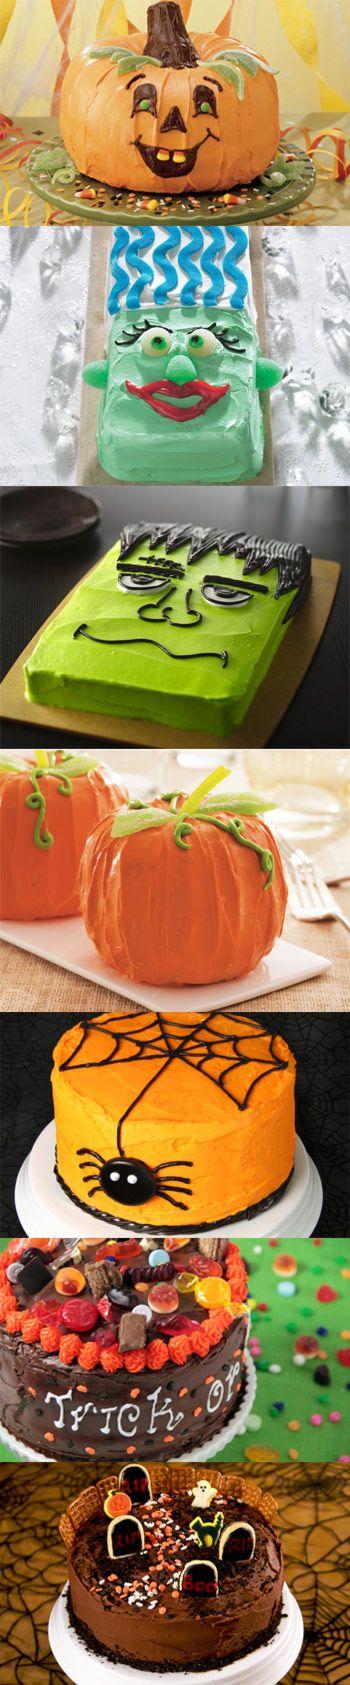 Halloween Cakes! i love the frankenstein for the fall festival cake walk at…